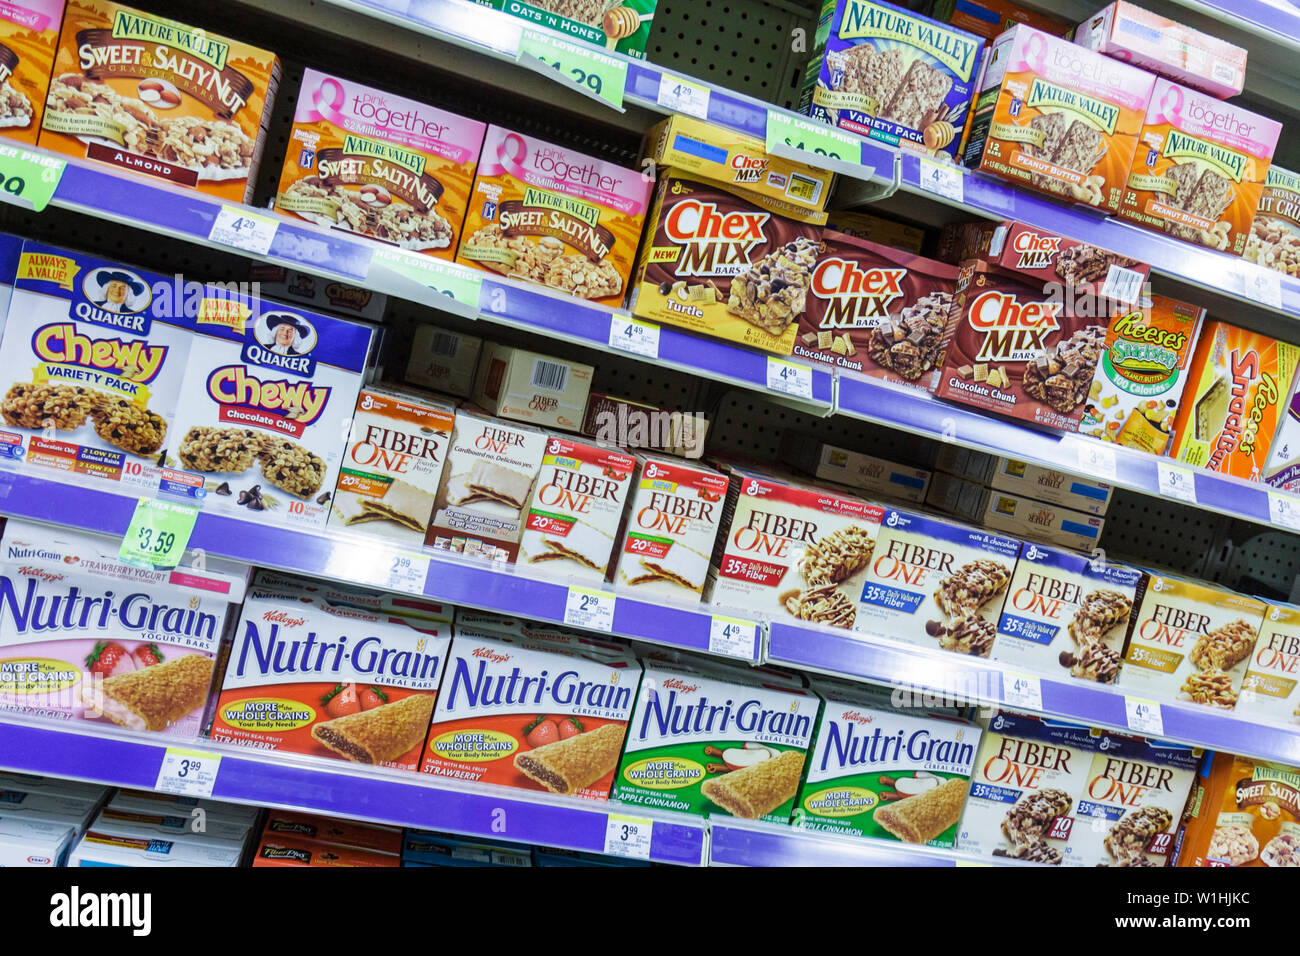 Miami Beach, Florida 41st Street Arthur Godfrey Road Walgreens Walgreens Drug Store Apothekenkette Geschäft Lebensmittel Cereal Bar Stockfoto